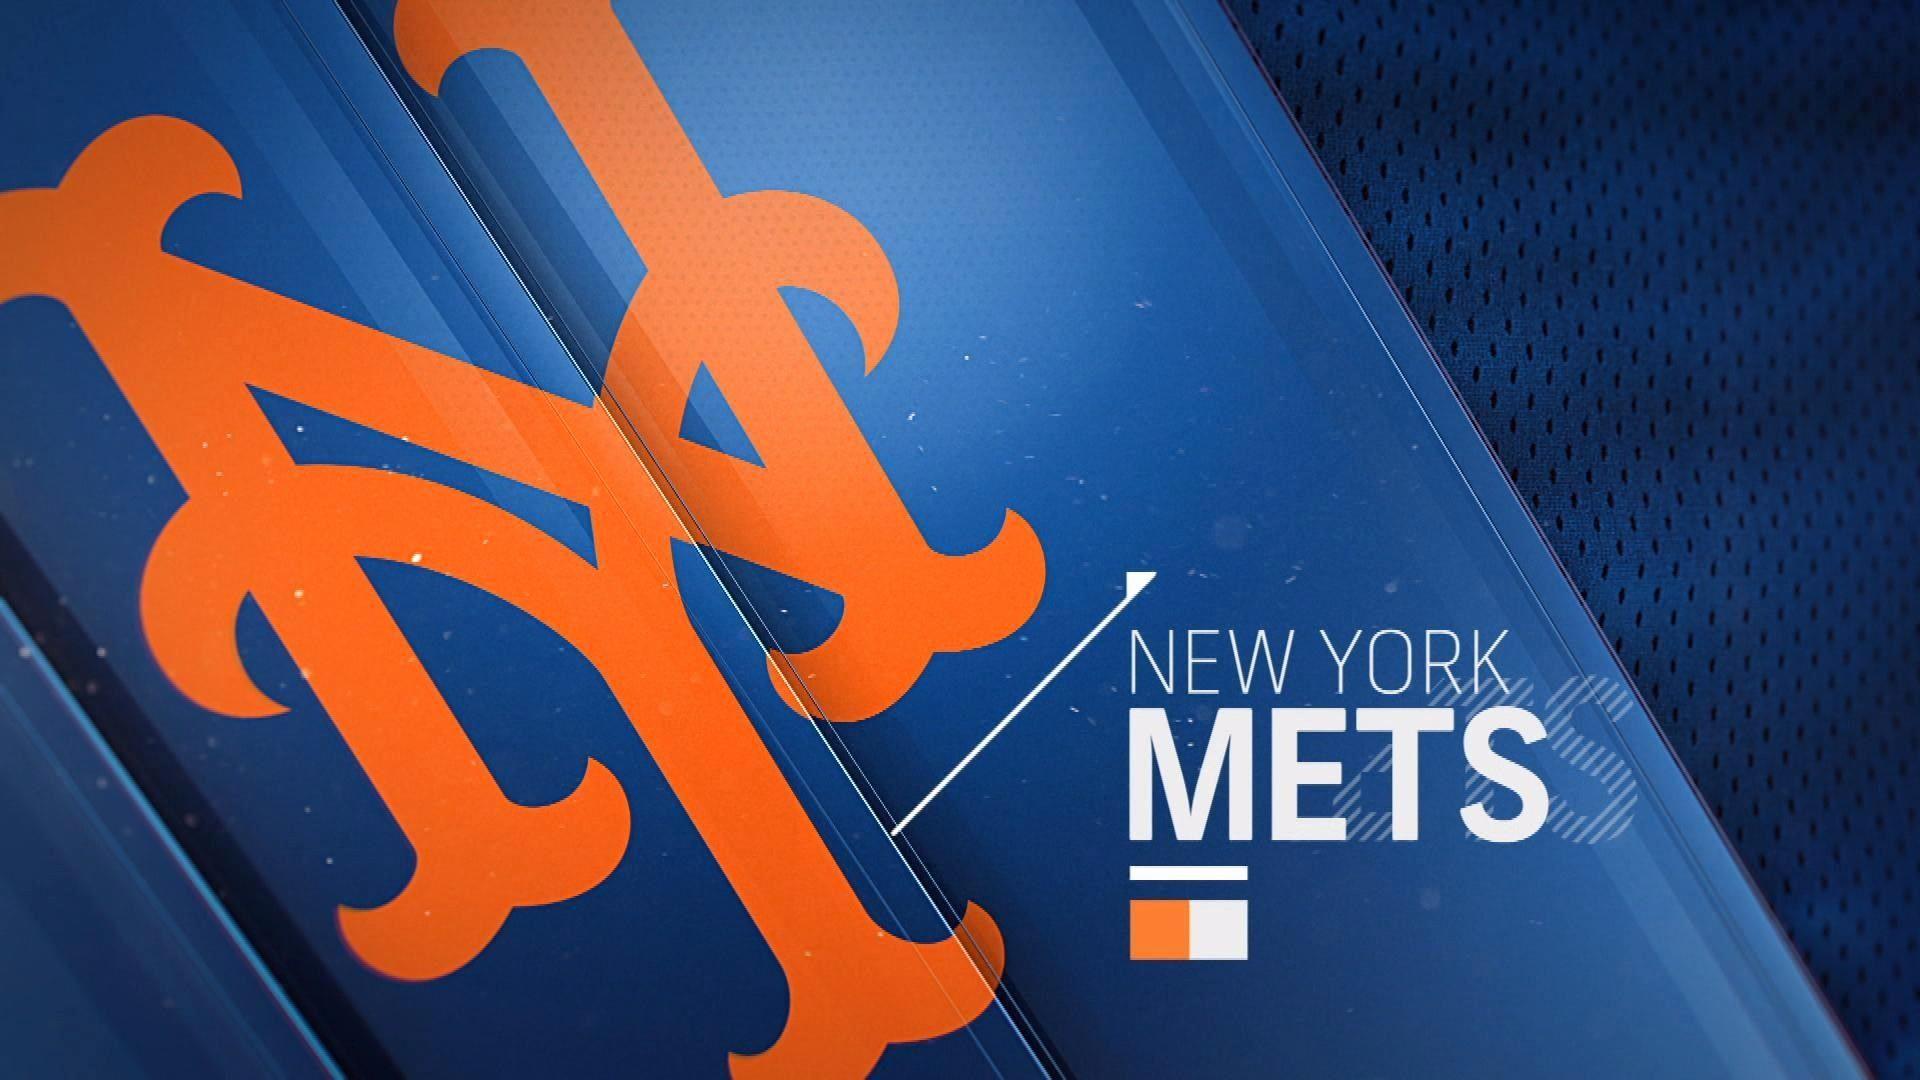 New York Mets full hd wallpaper